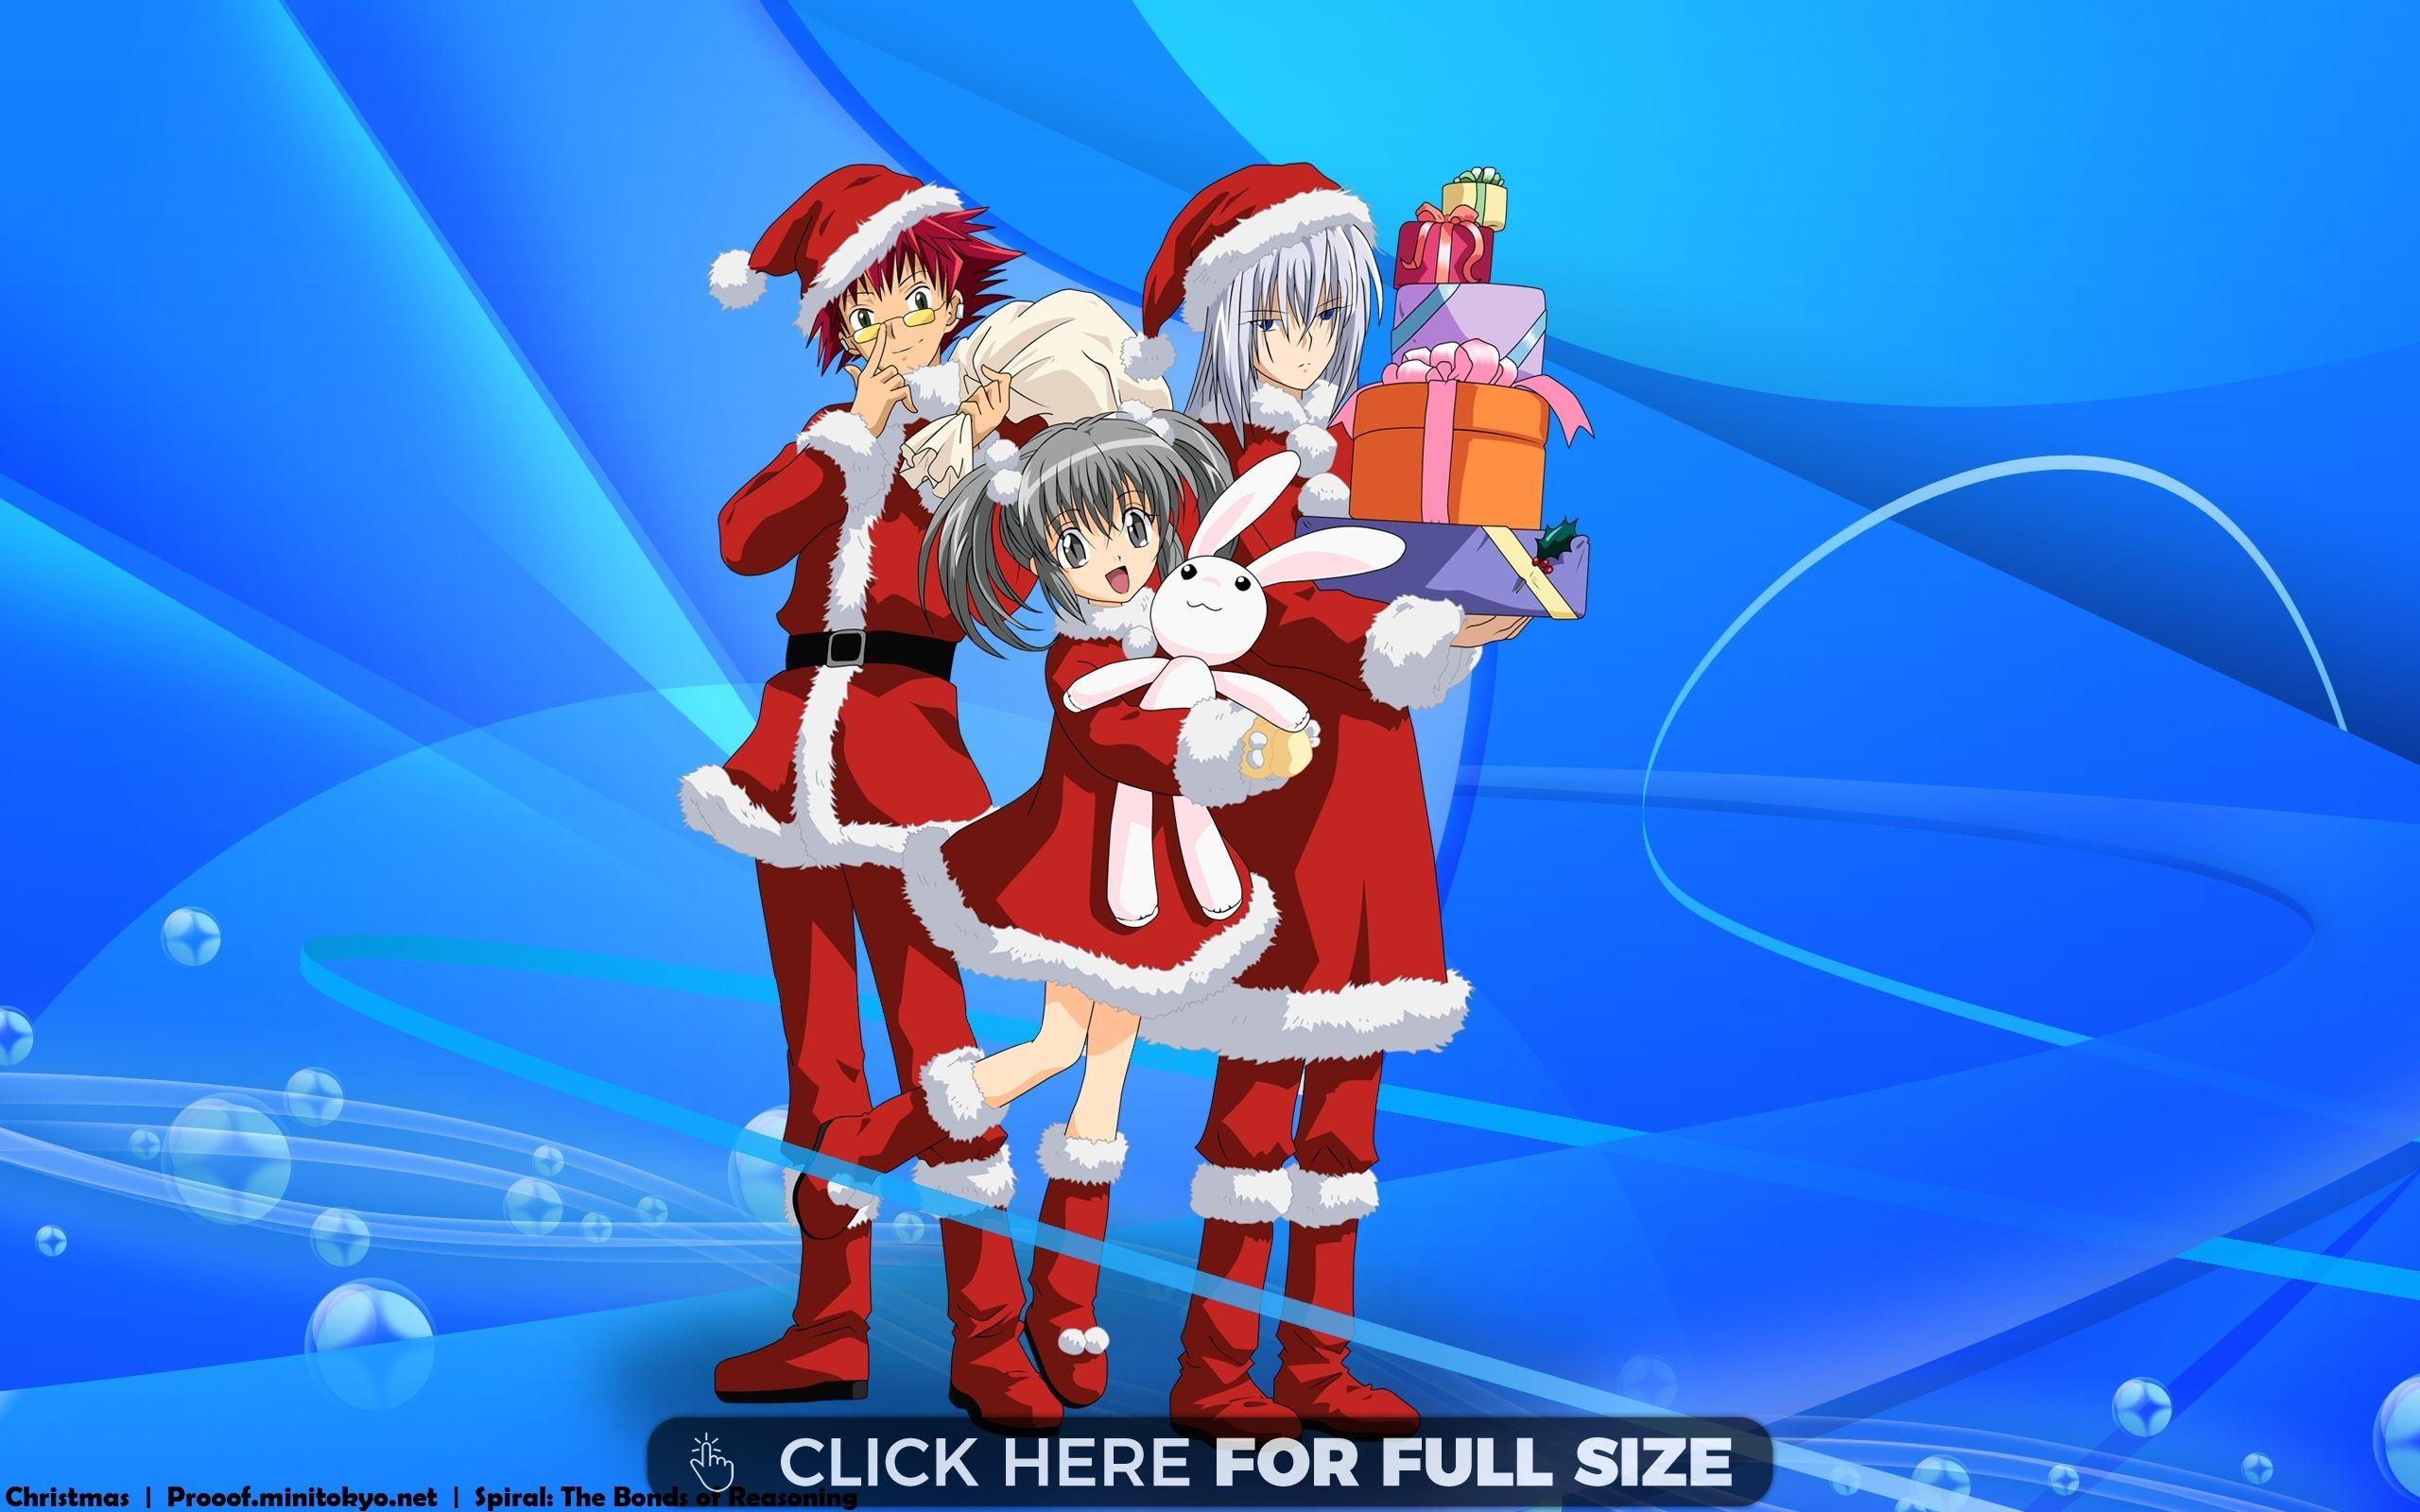 Betty boop christmas wallpaper wallpapertag - Anime girl christmas wallpaper ...